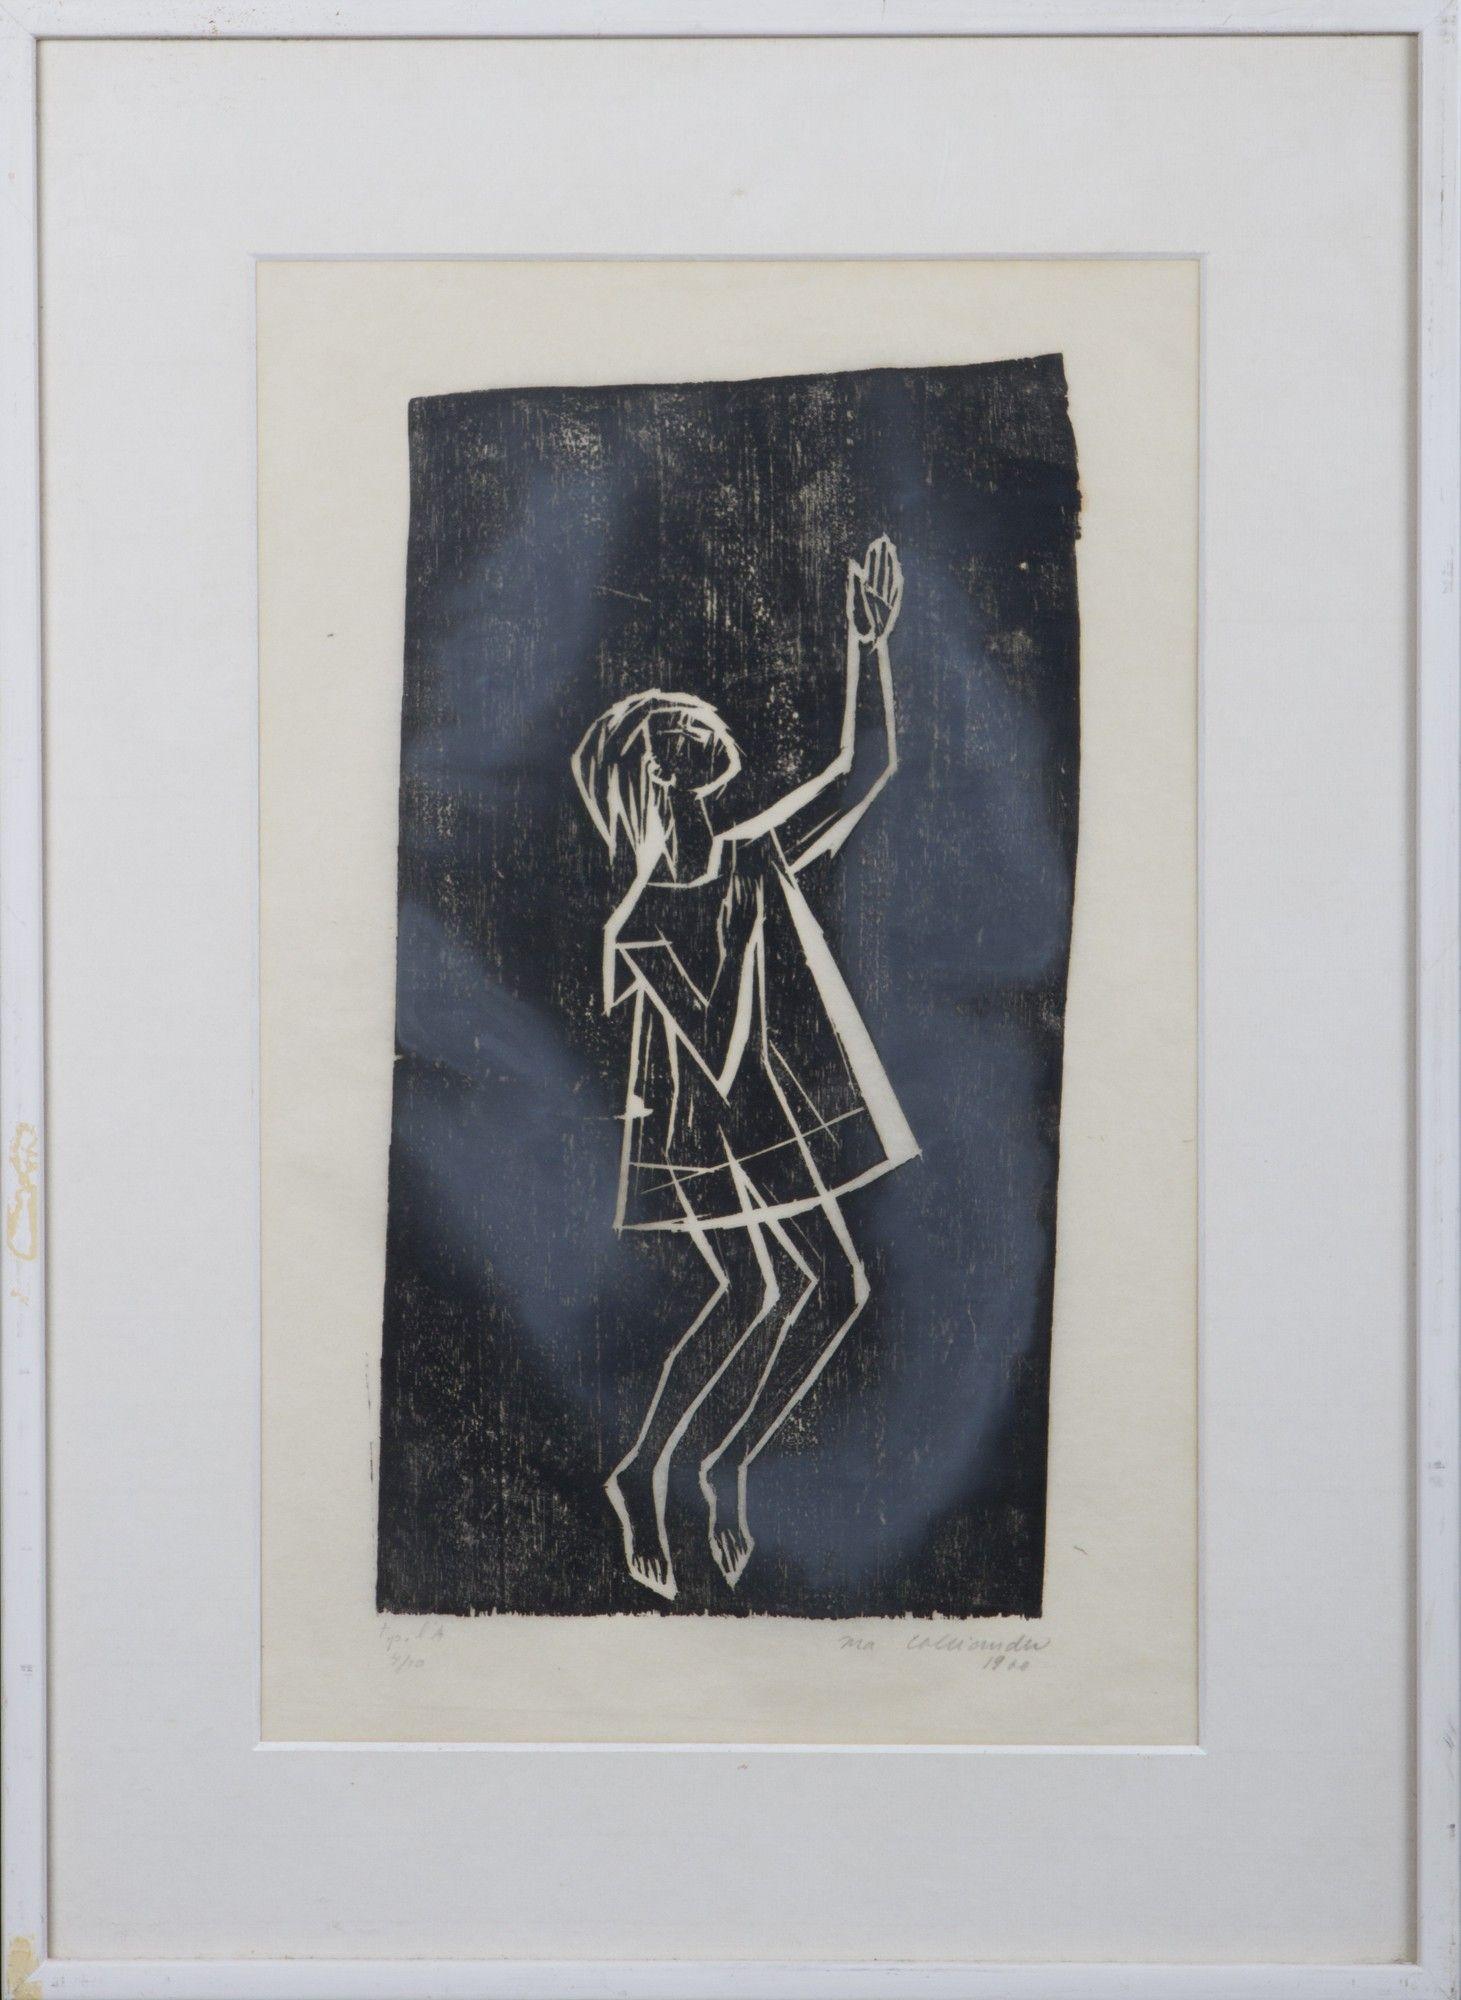 Ina Colliander, 1960, puupiirros, 45x28 cm, edition 4/10 - Hagelstam A130